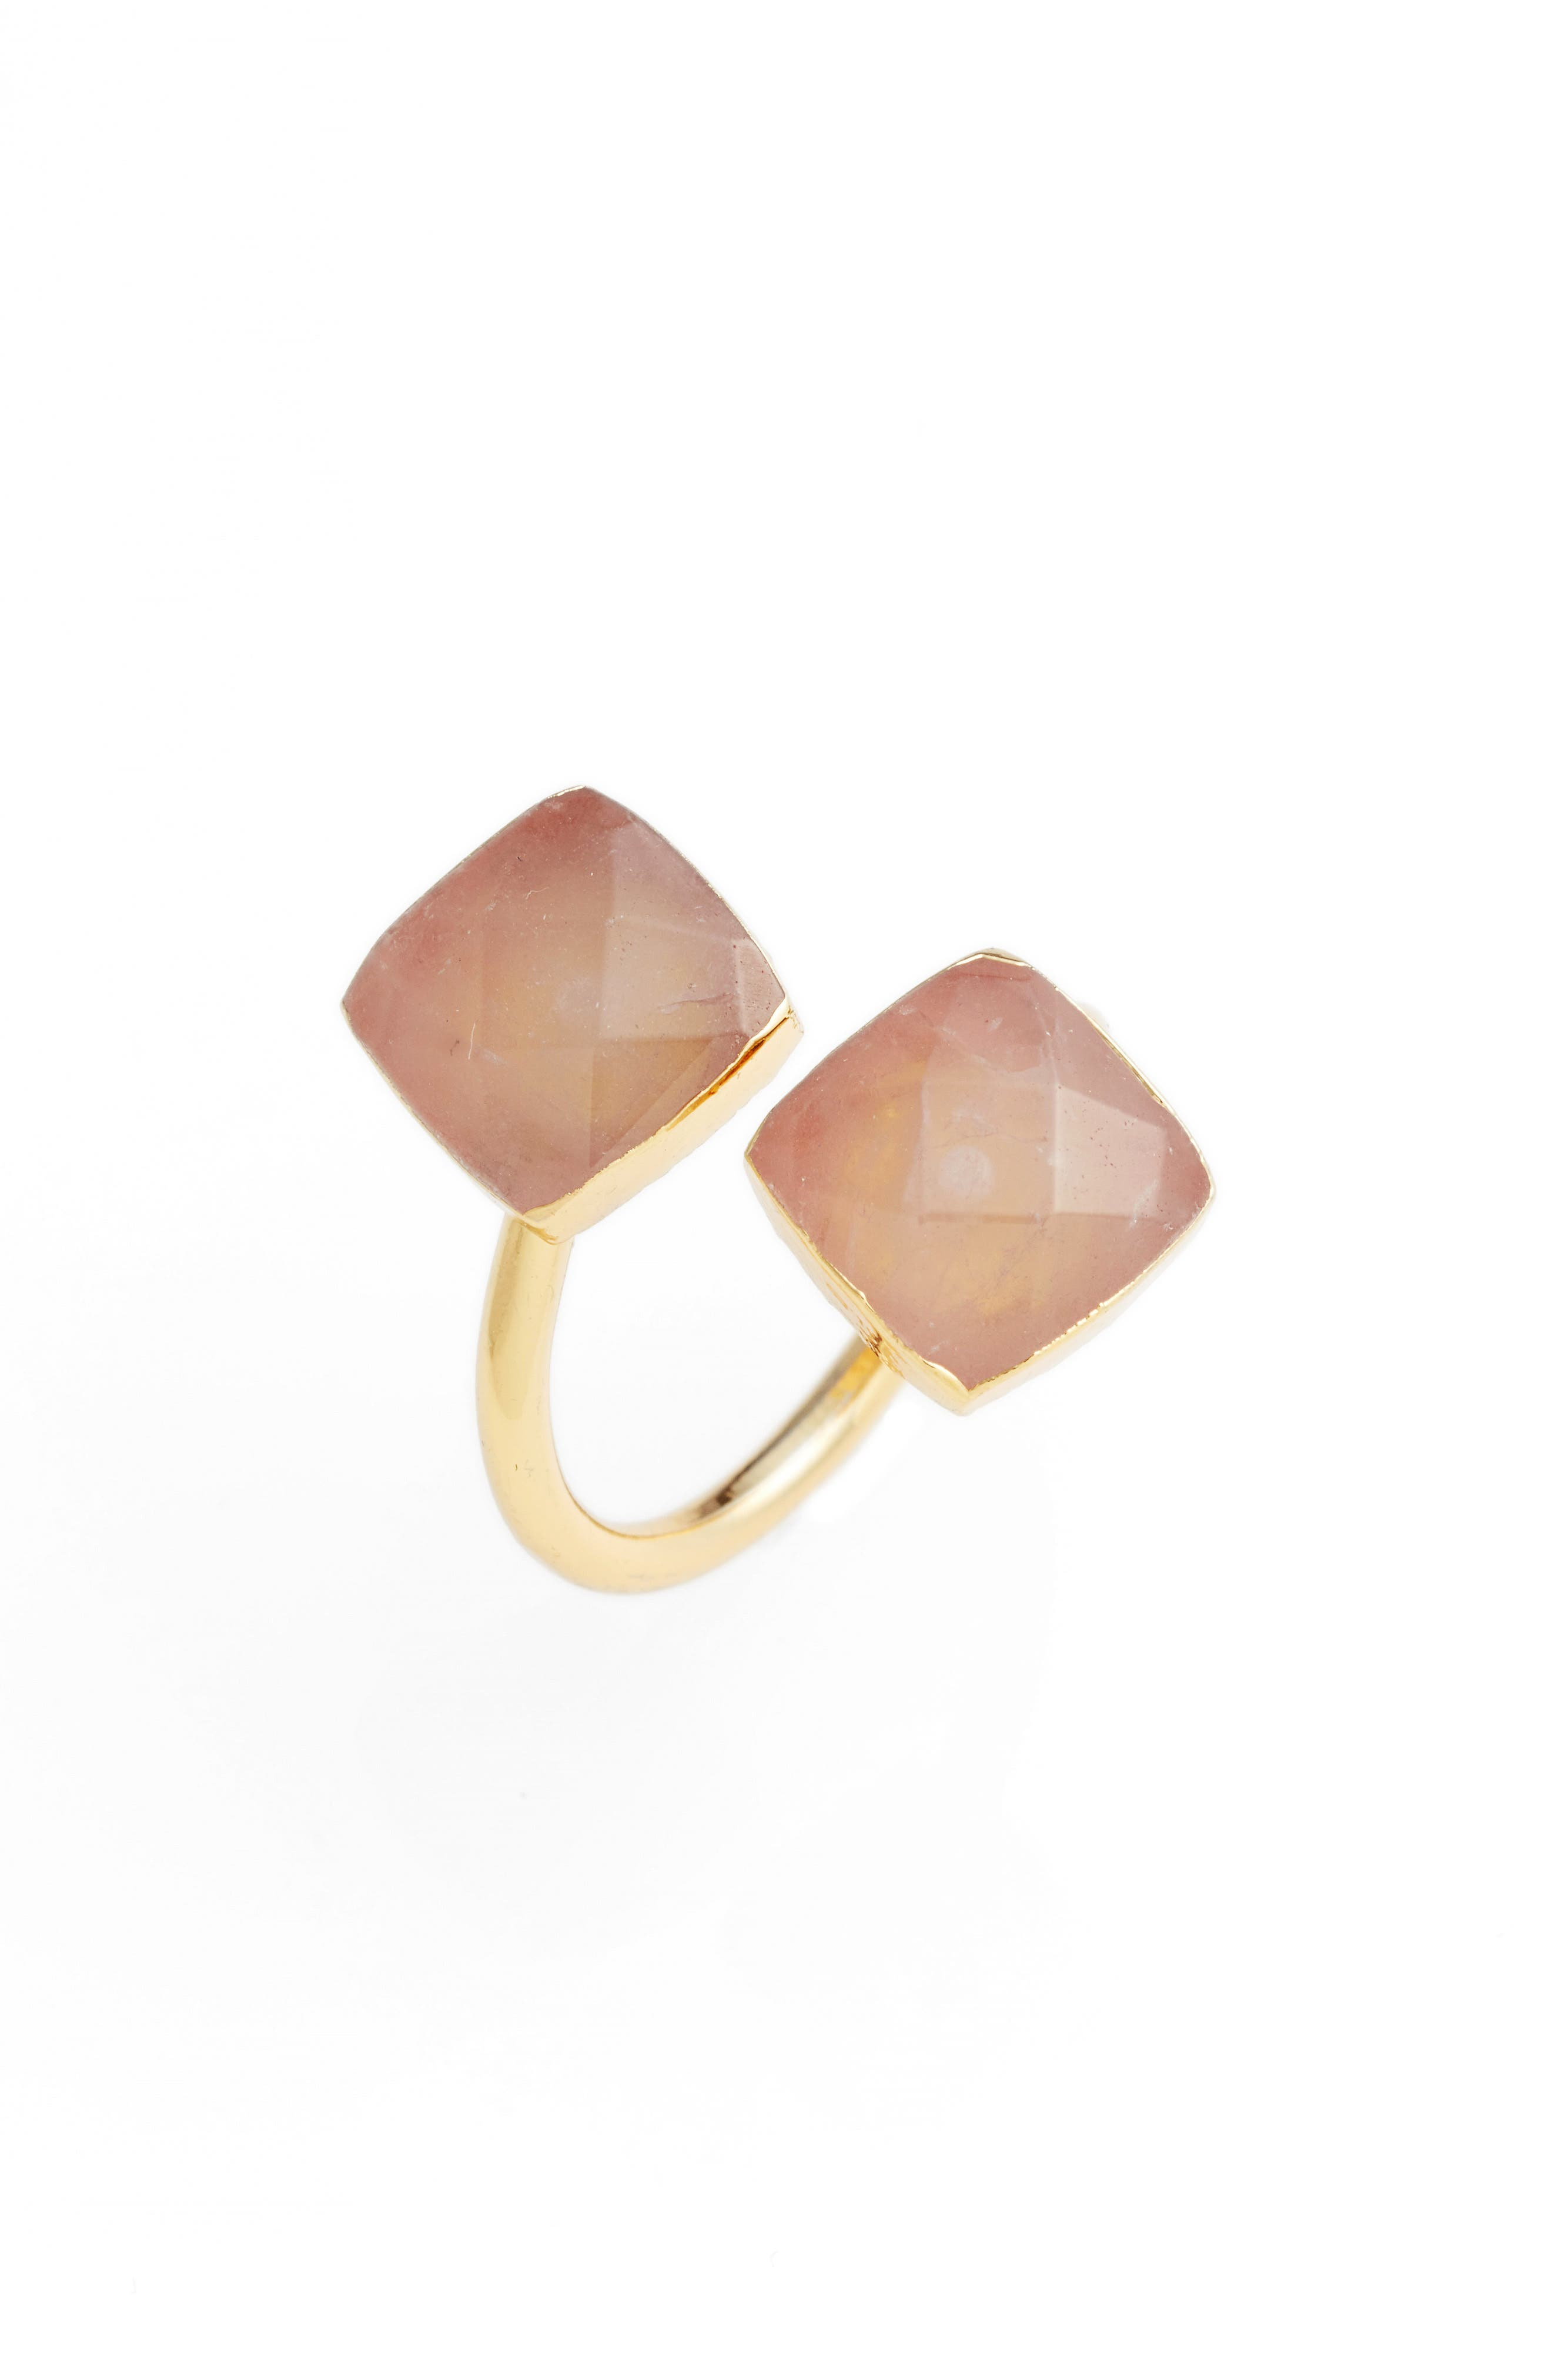 Elise M. Arabesque Semiprecious Stone Adjustable Ring